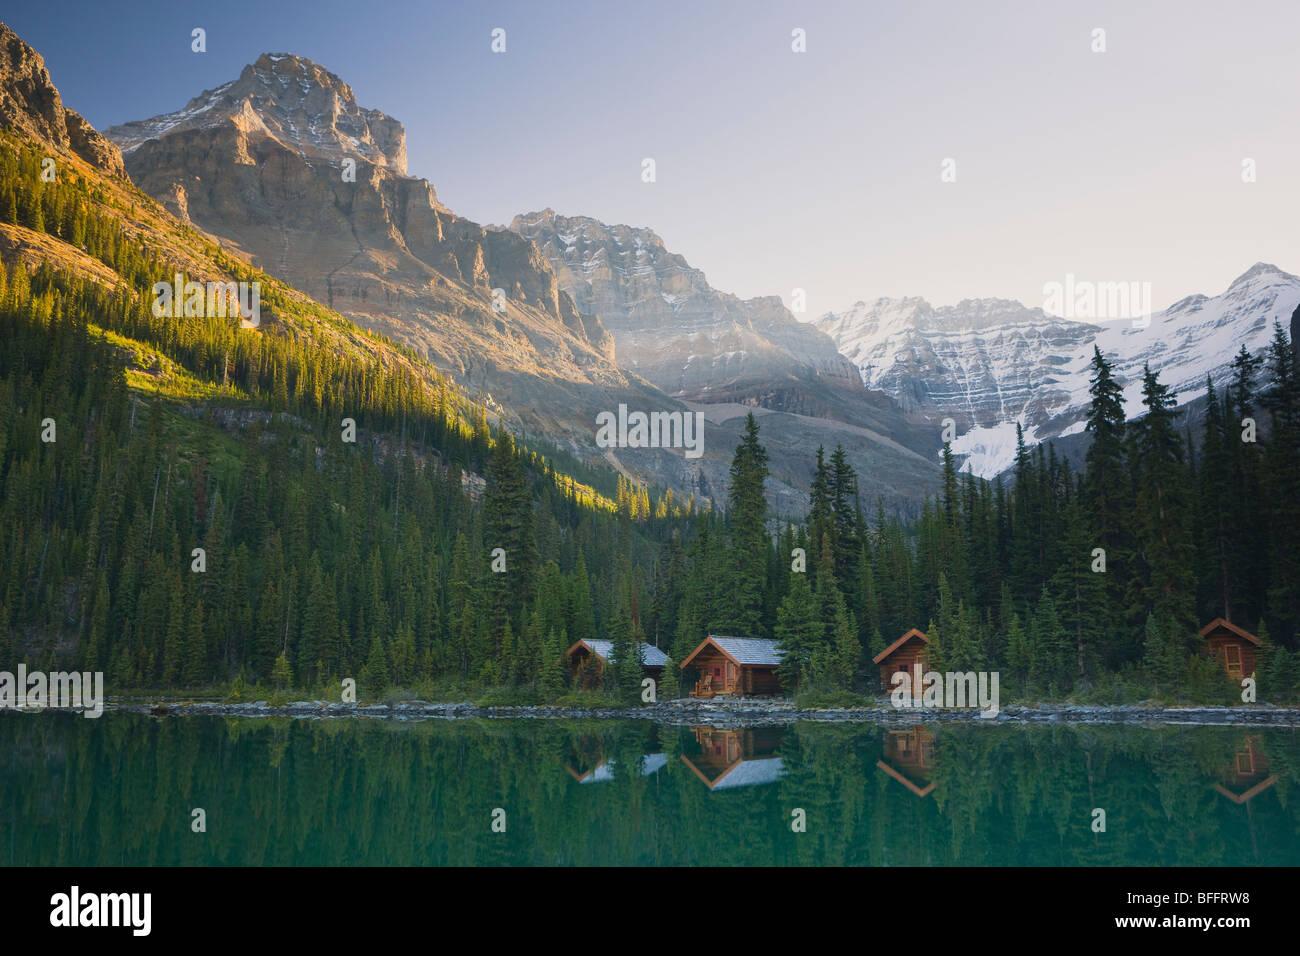 Lago O'Hara cabañas, Parque Nacional Yoho, British Columbia, Canadá Foto de stock